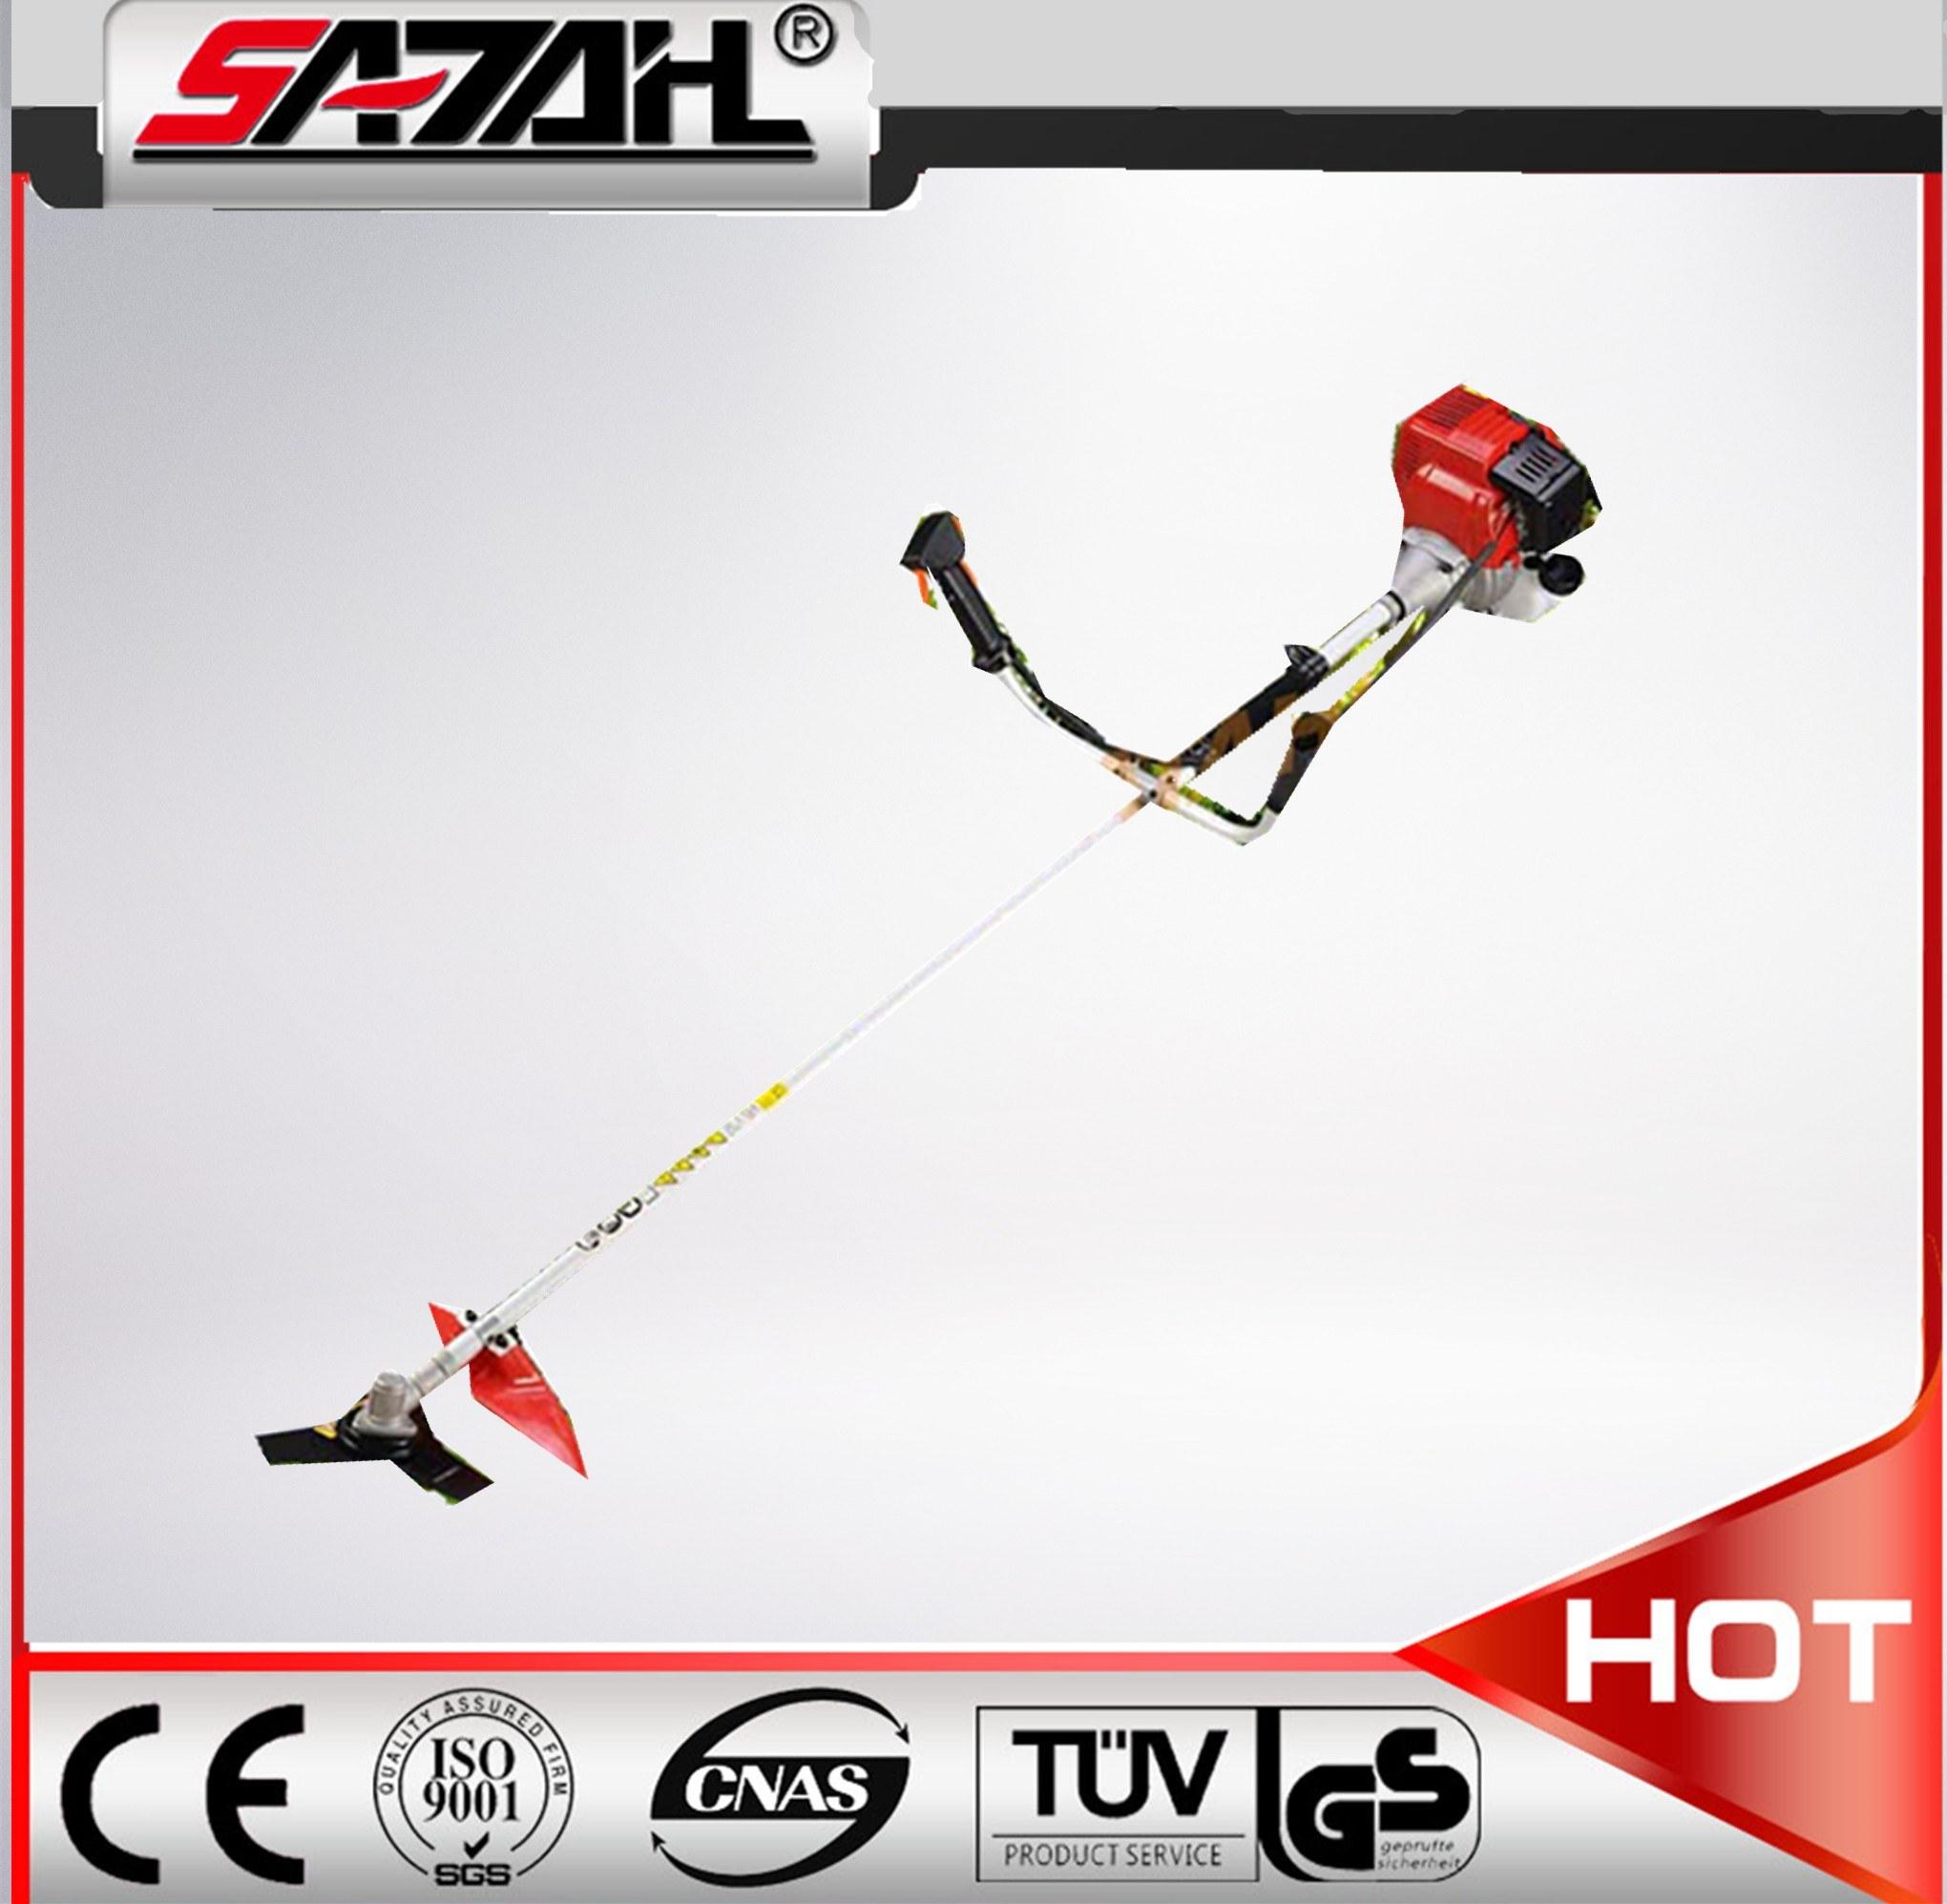 Satahl-Cg139 31cc 0.75kw Professioanl Gasoline Brush Cutter